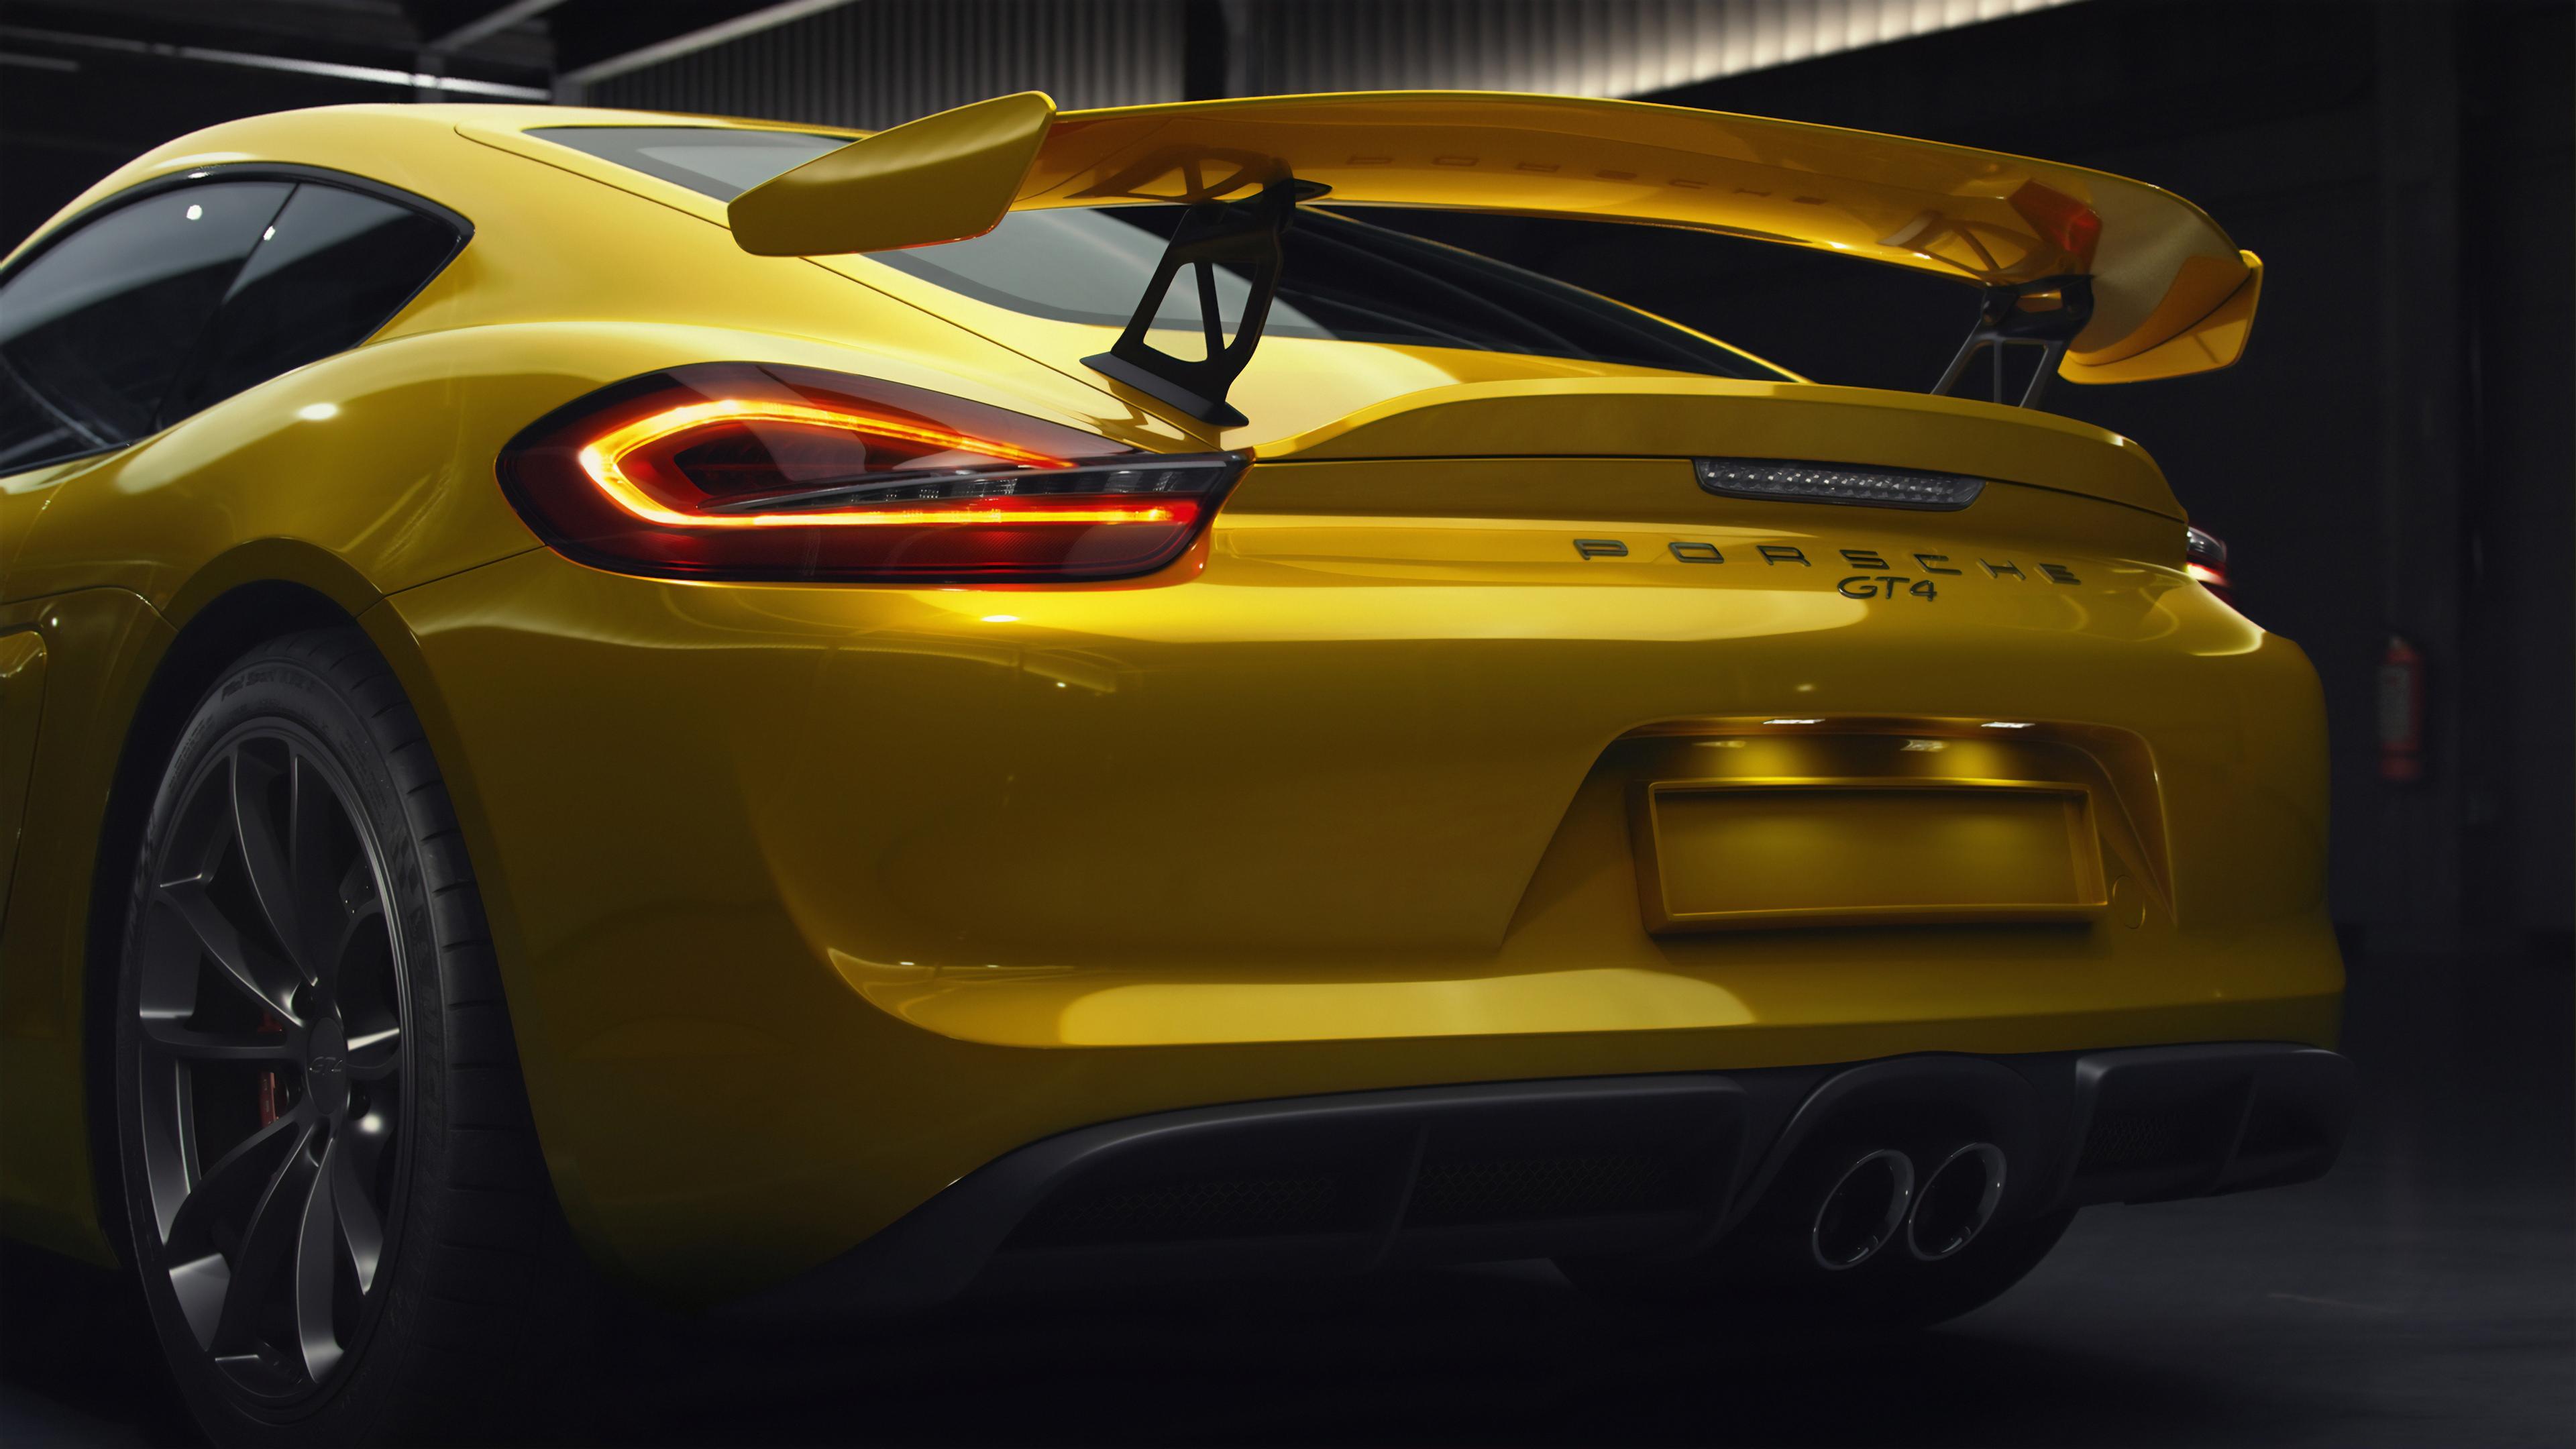 yellow porsche gt3 2019 1565054862 - Yellow Porsche Gt3 2019 - porsche wallpapers, hd-wallpapers, cars wallpapers, 4k-wallpapers